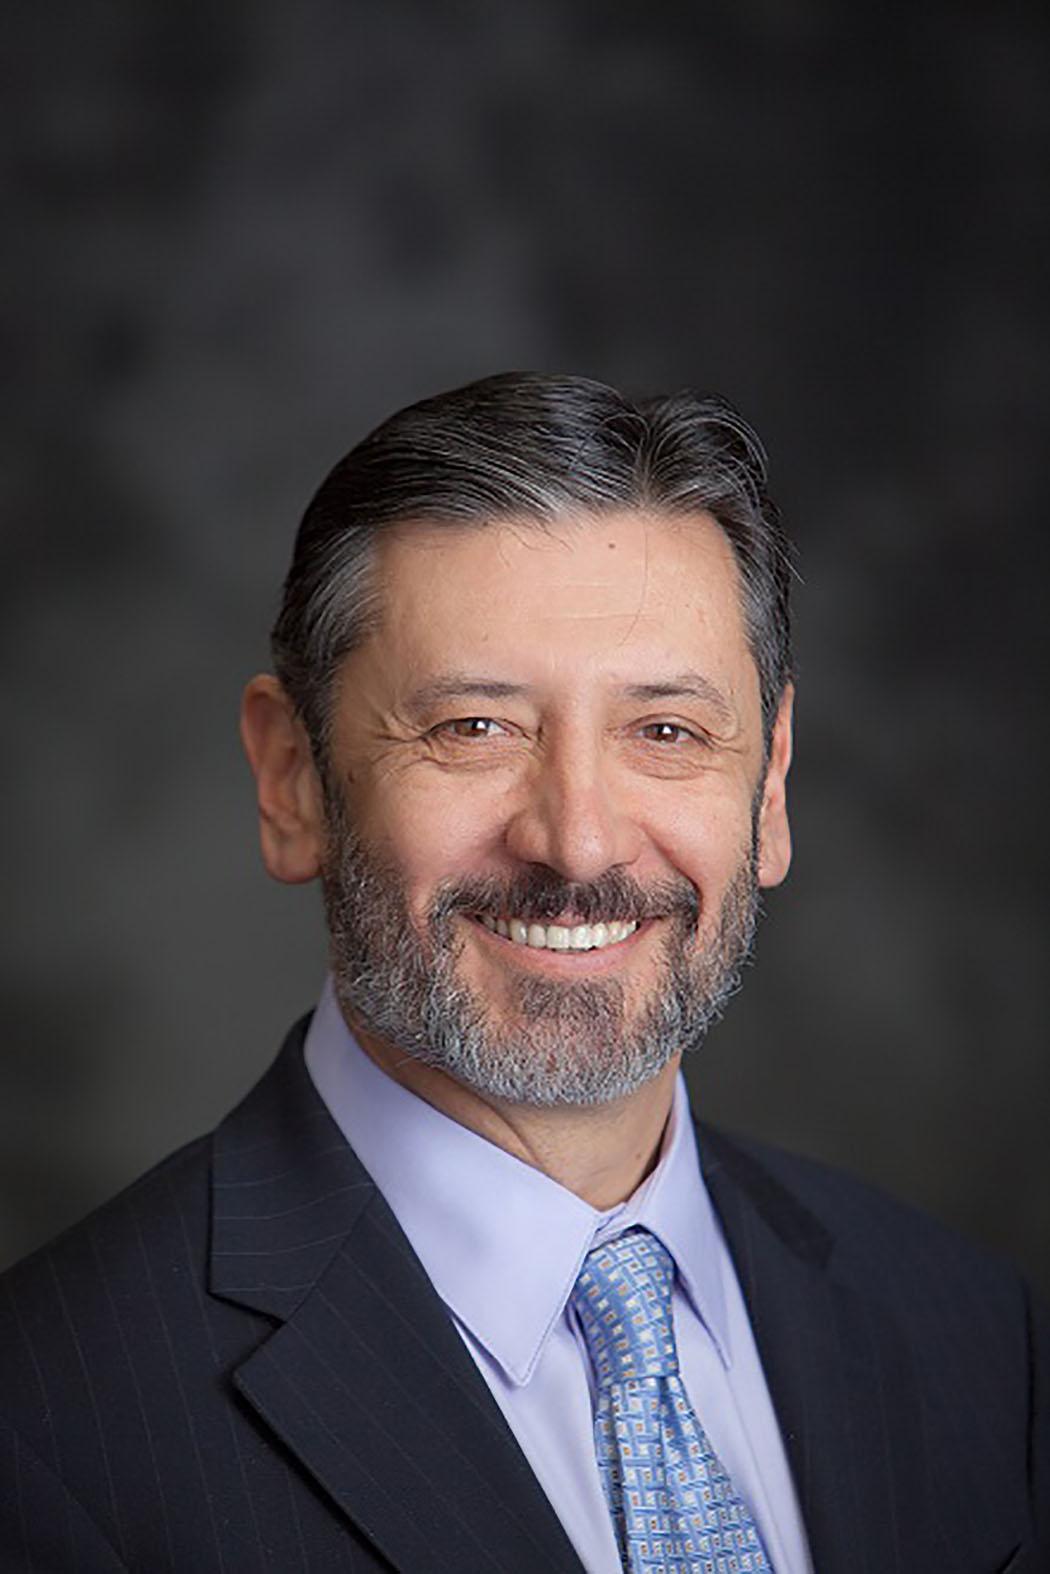 Ignacio Correa-Ortiz_HR.jpg